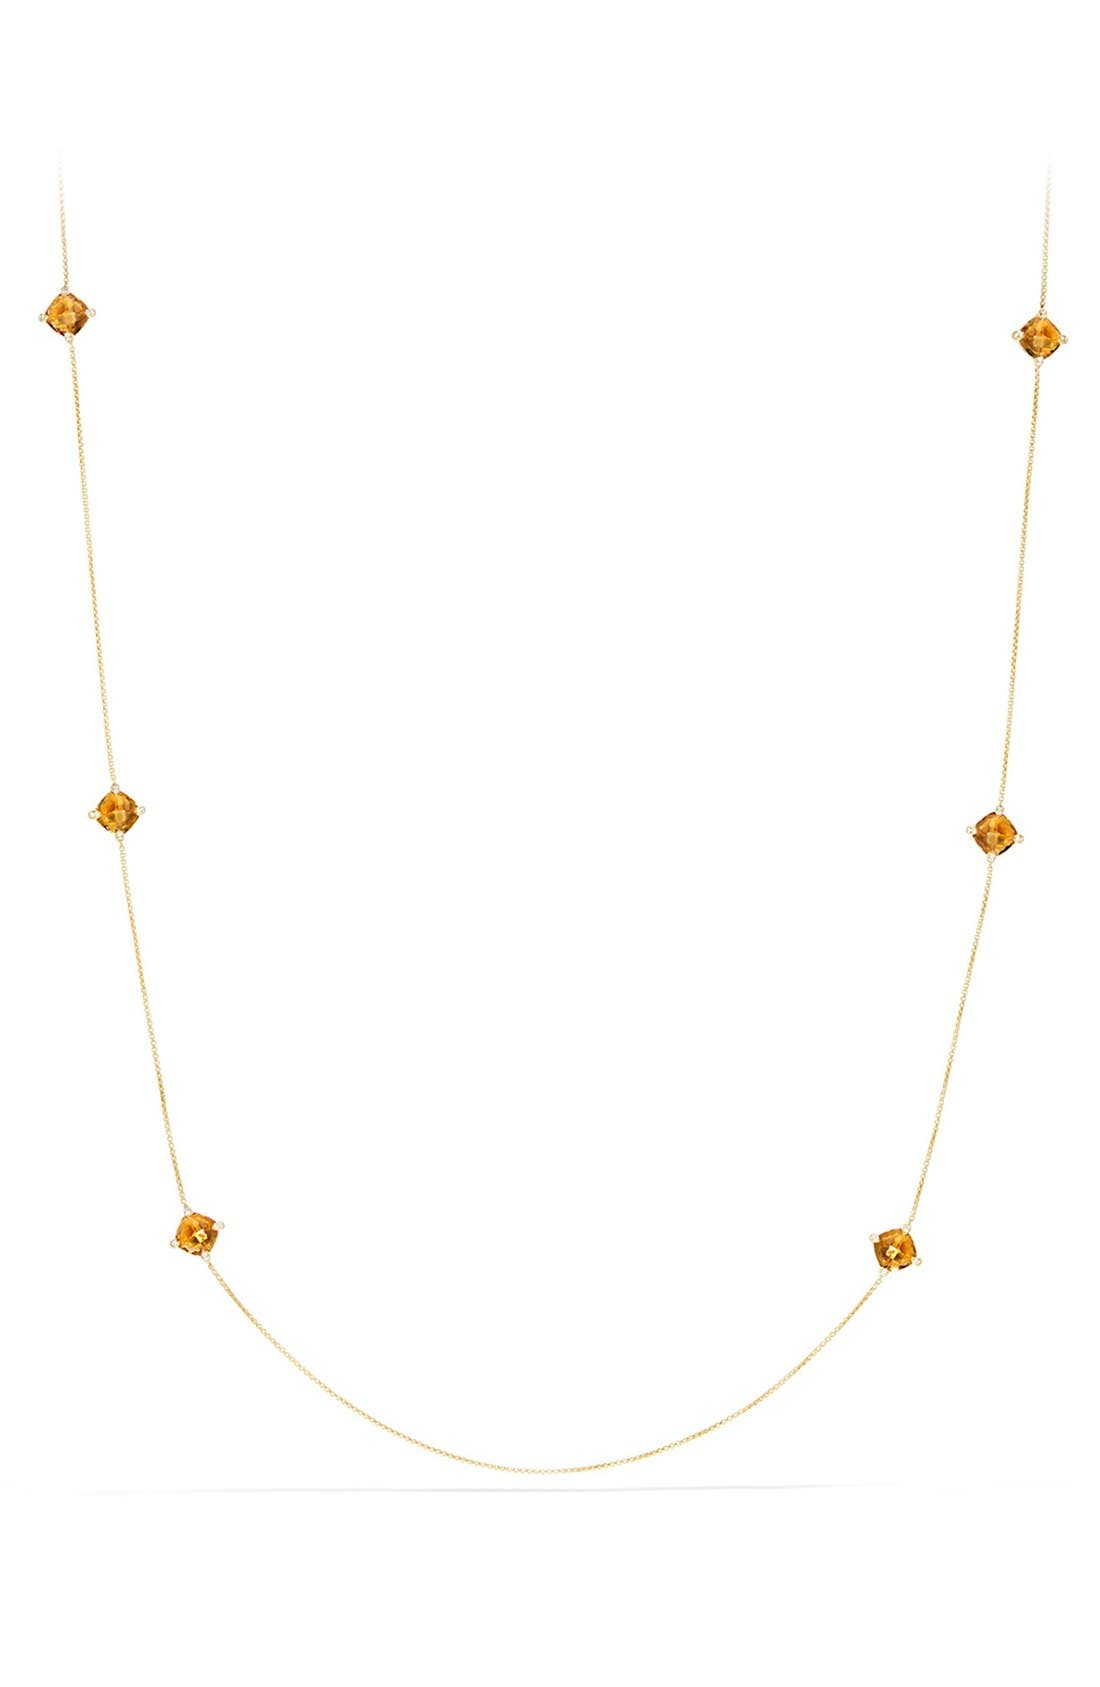 David Yurman 'Châtelaine' Long Semiprecious Stone Necklace with Diamonds